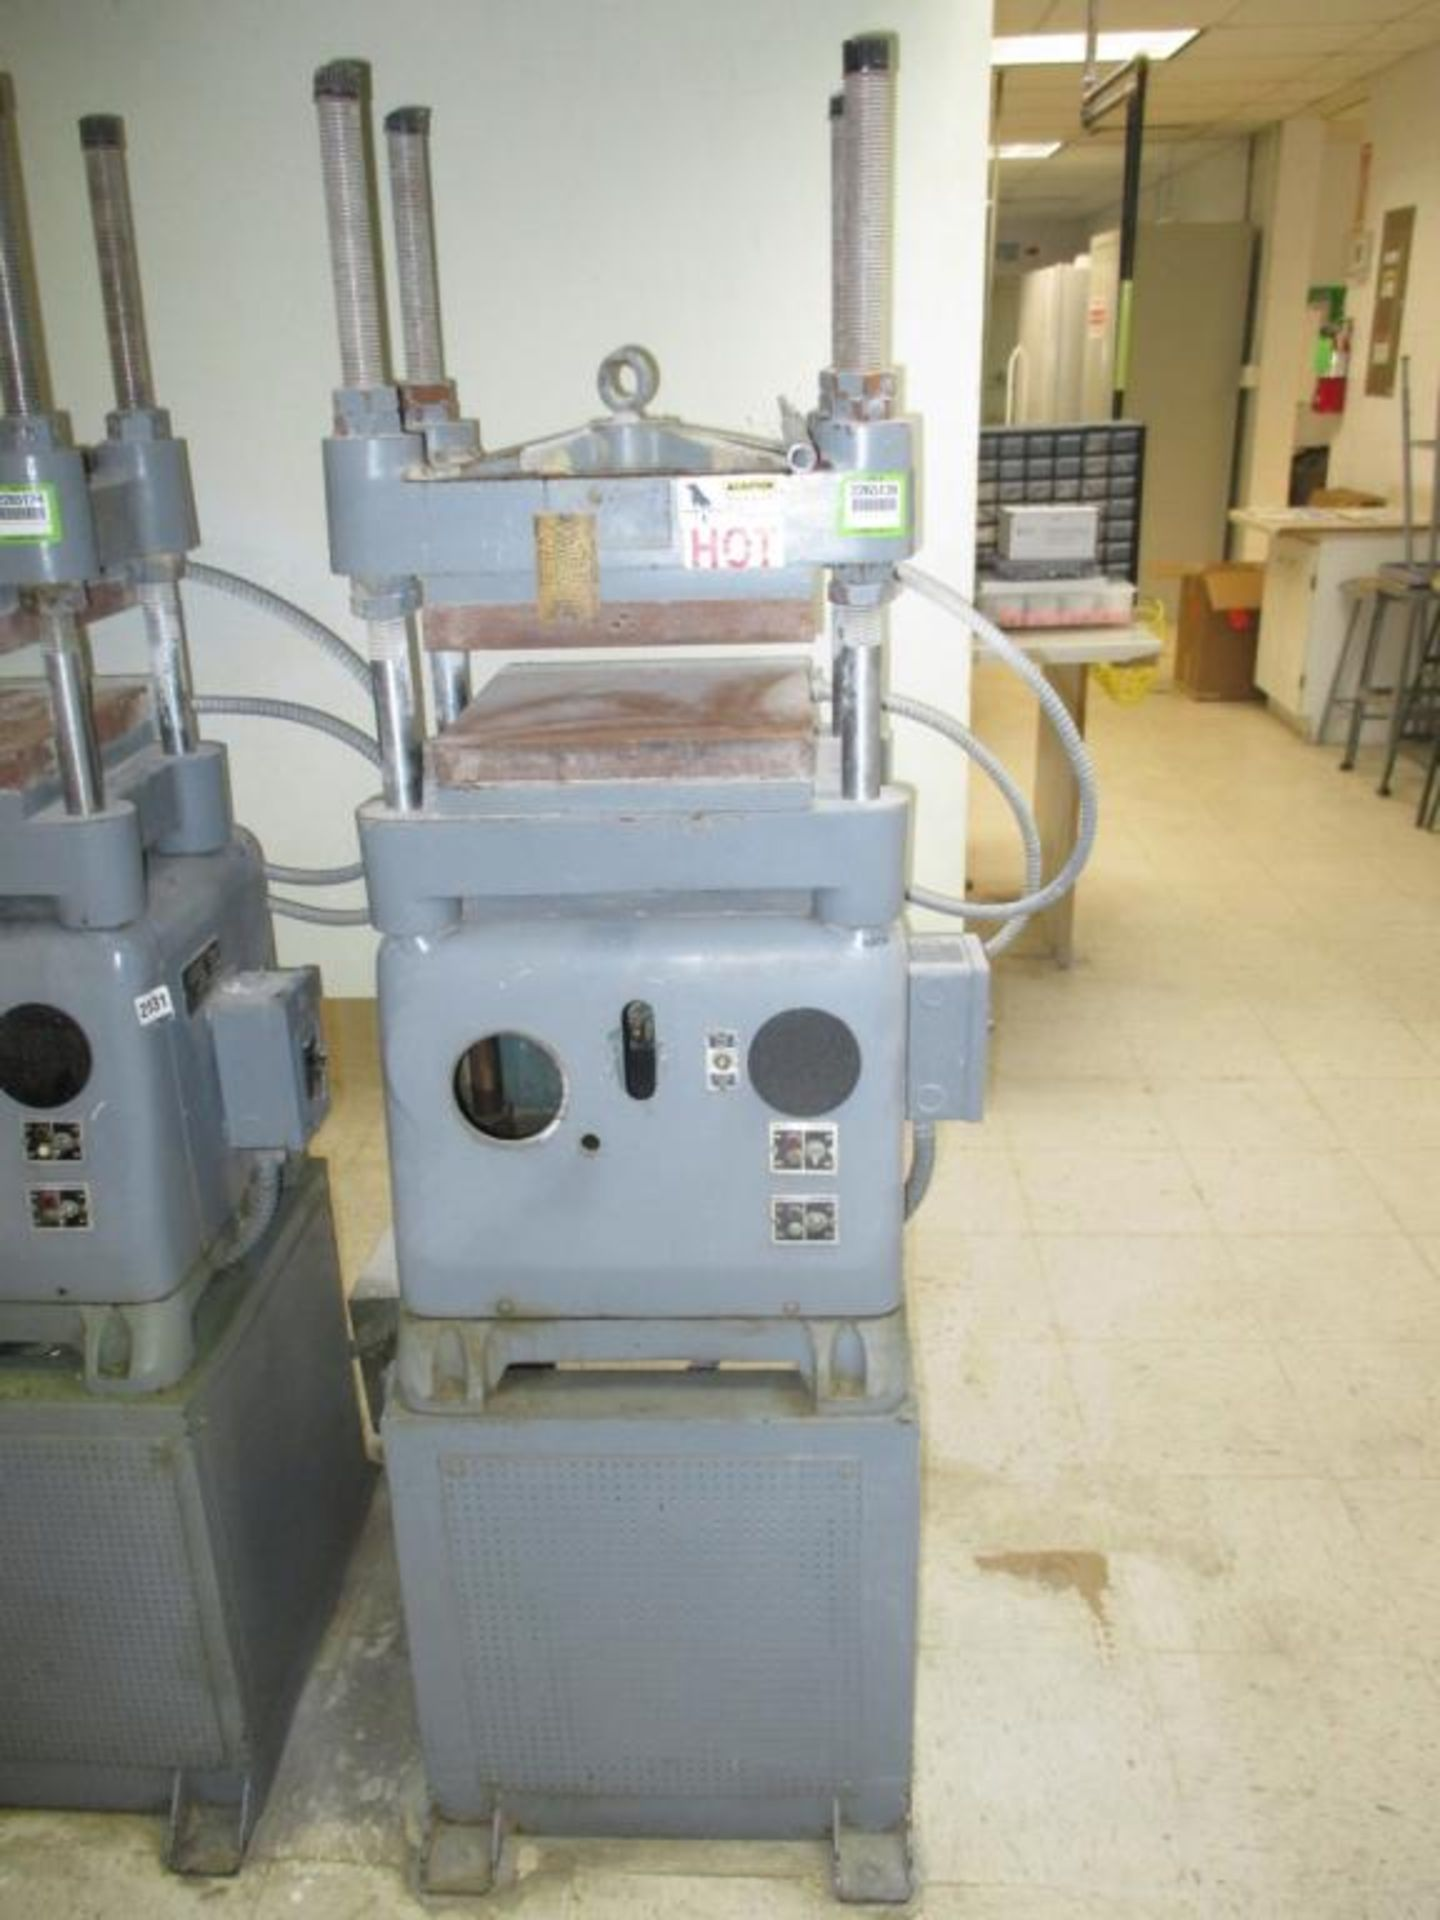 Lot 123 - 12 ton Heated Platen Press